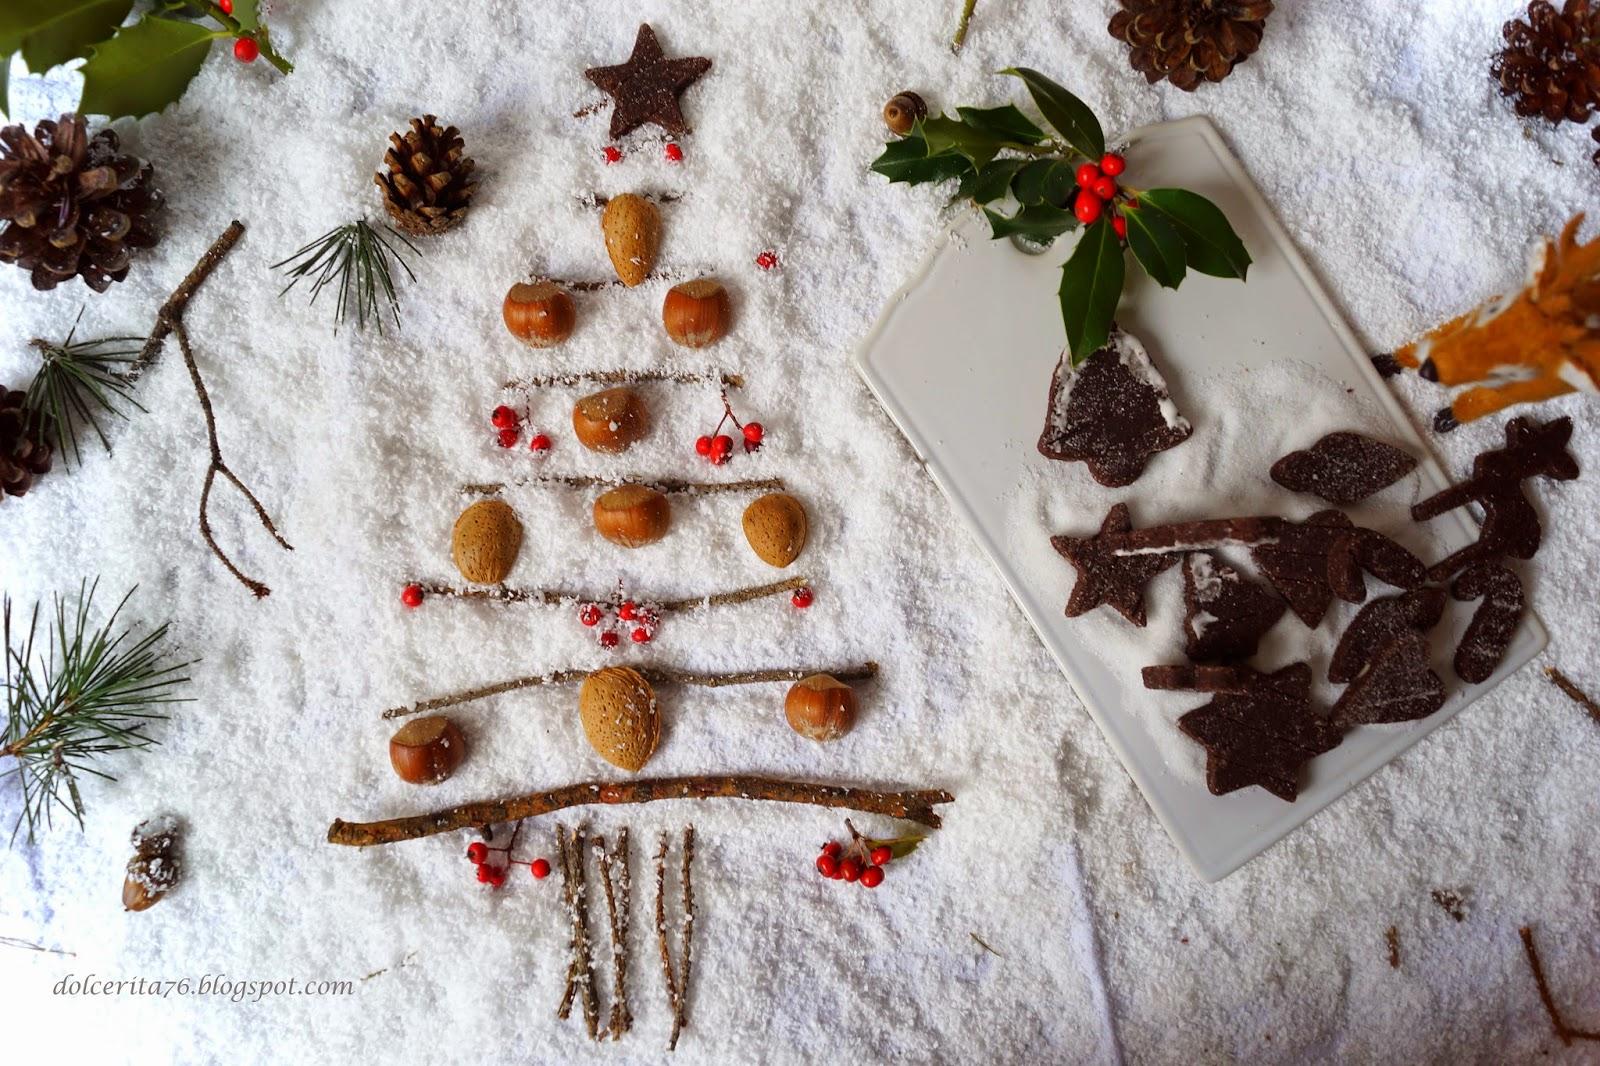 Dolce Rita A Christmas Chocolate Treat From Switzerland Brunsli